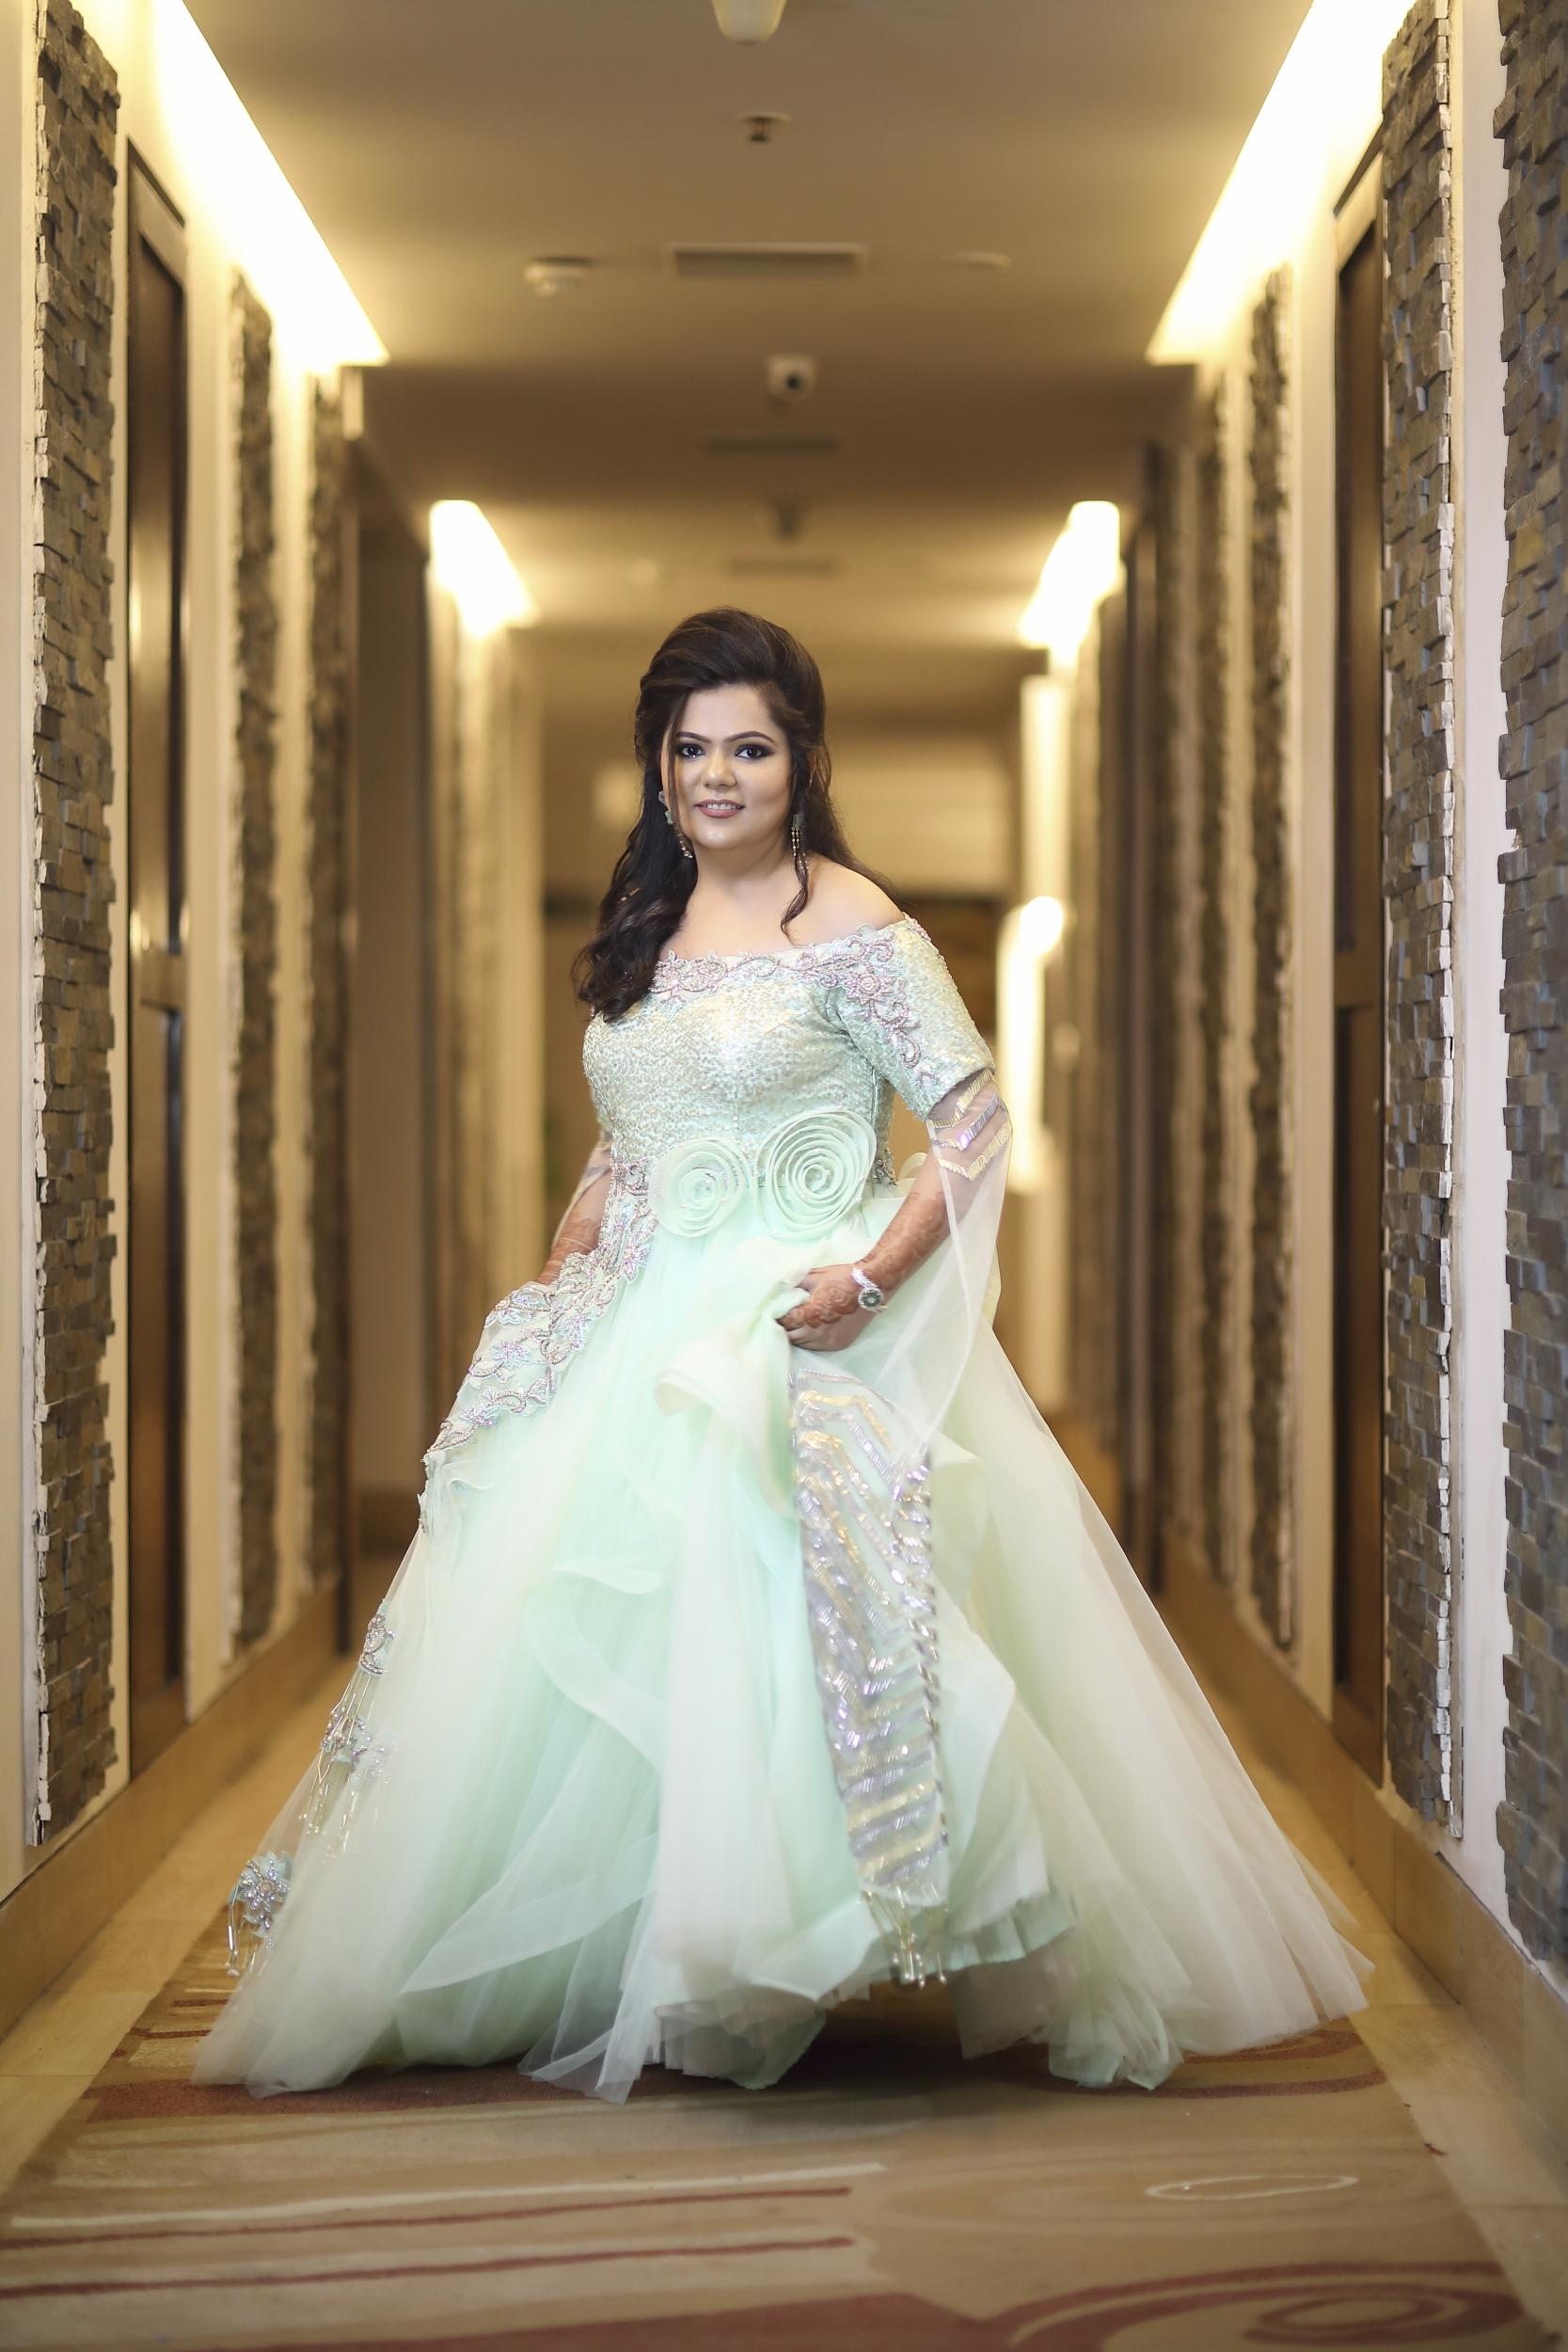 TWR Best candid wedding 91 photographers Delhi